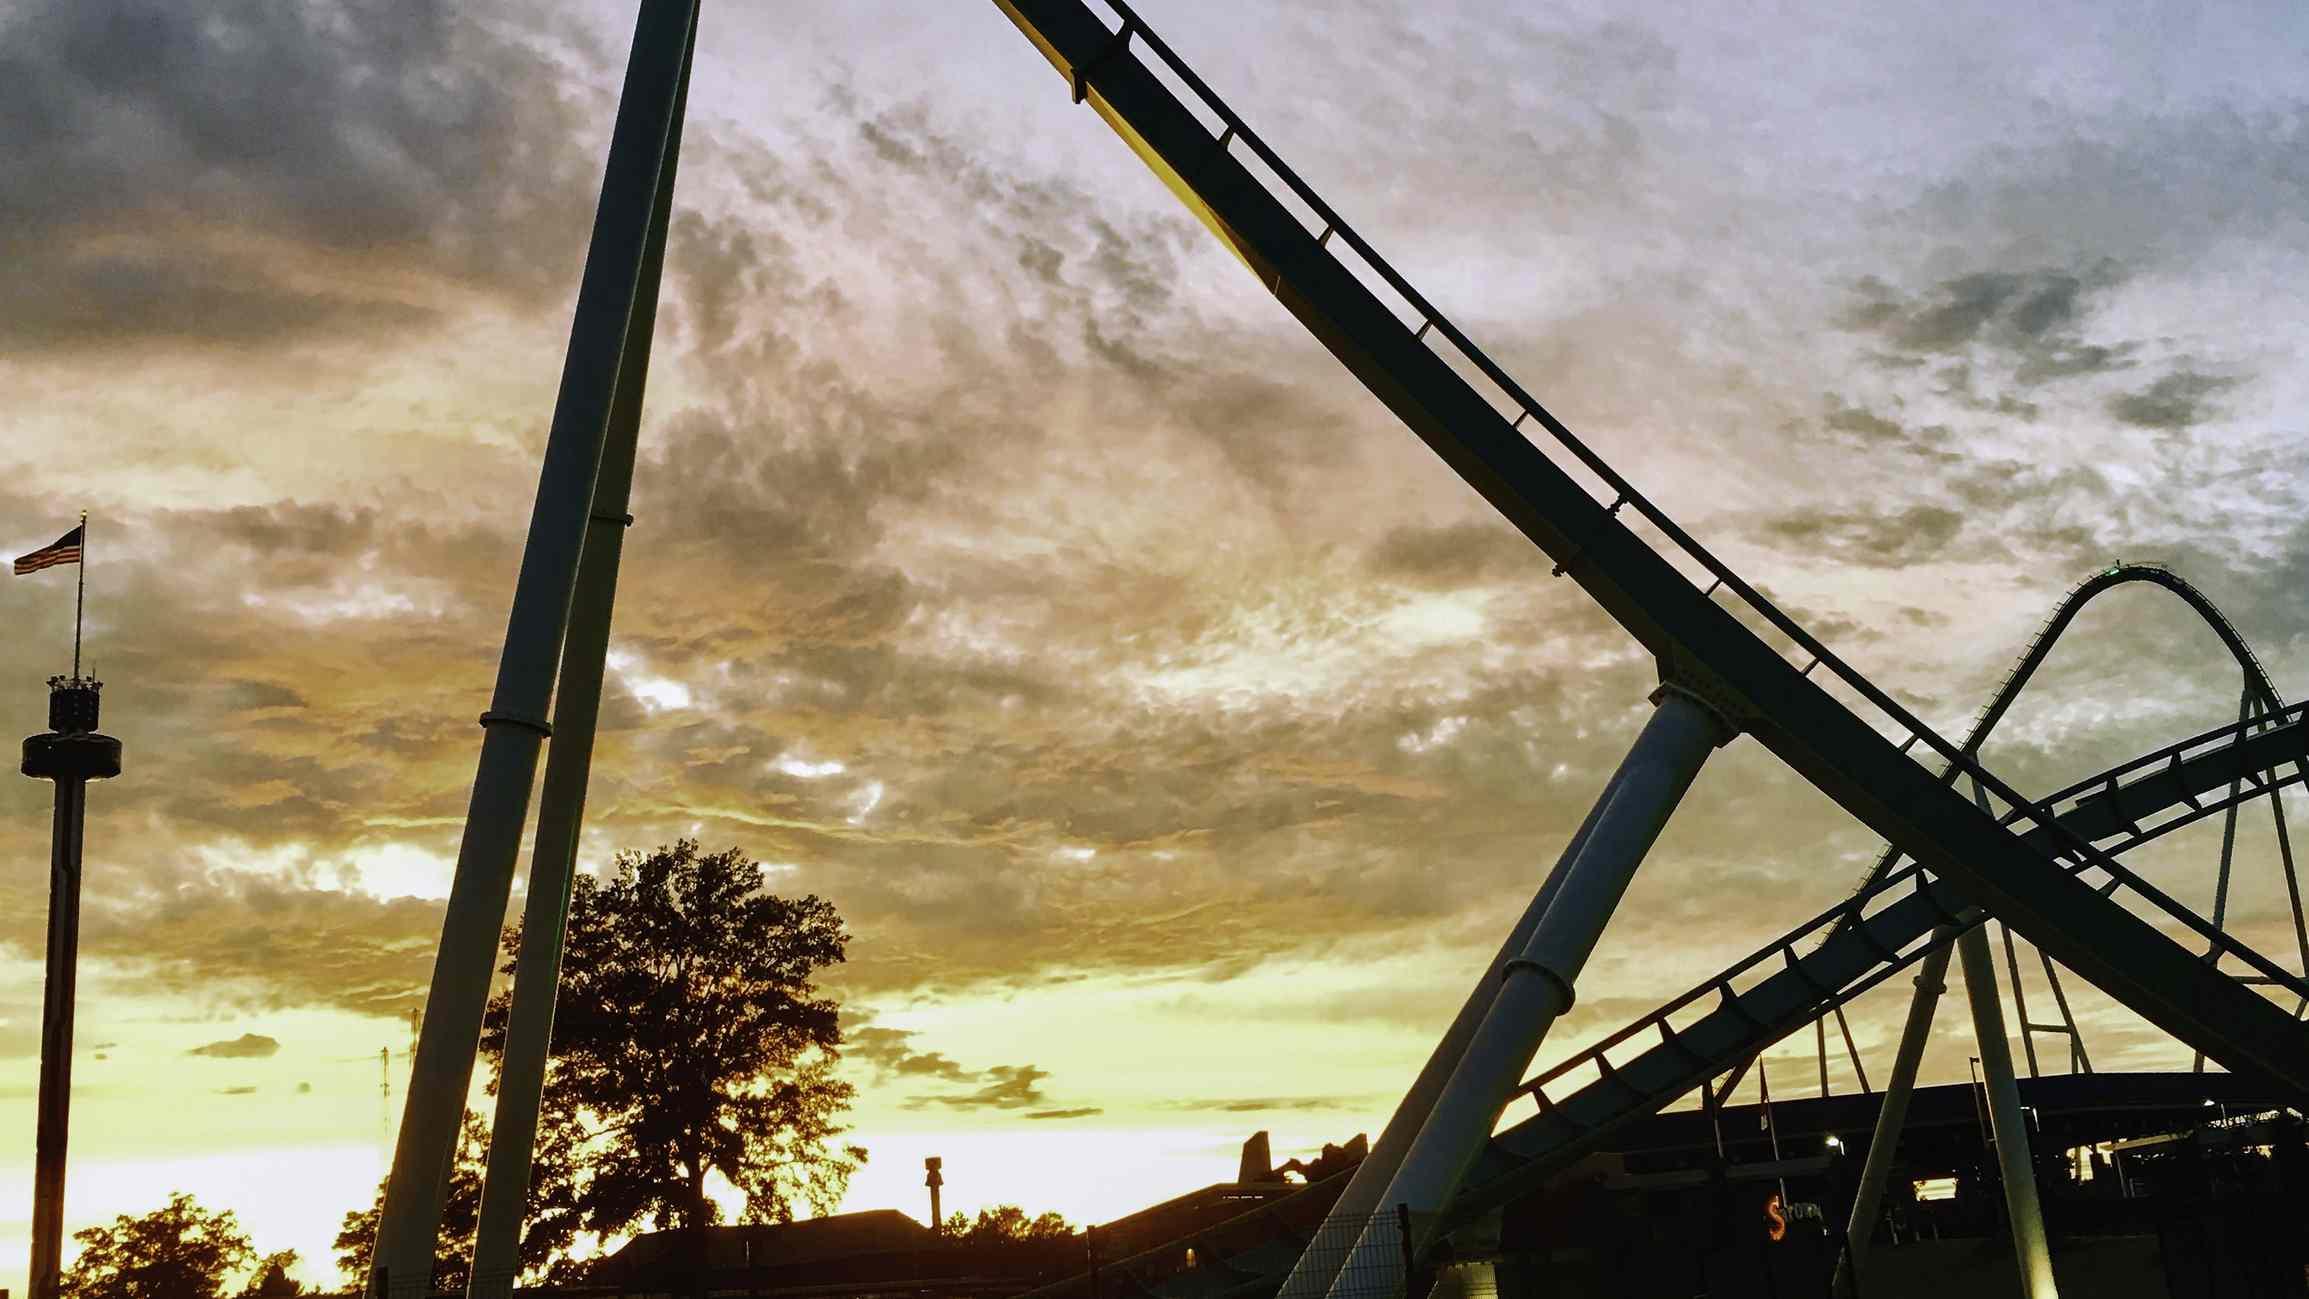 Fury 325 Coaster at Carowinds Amusement Park